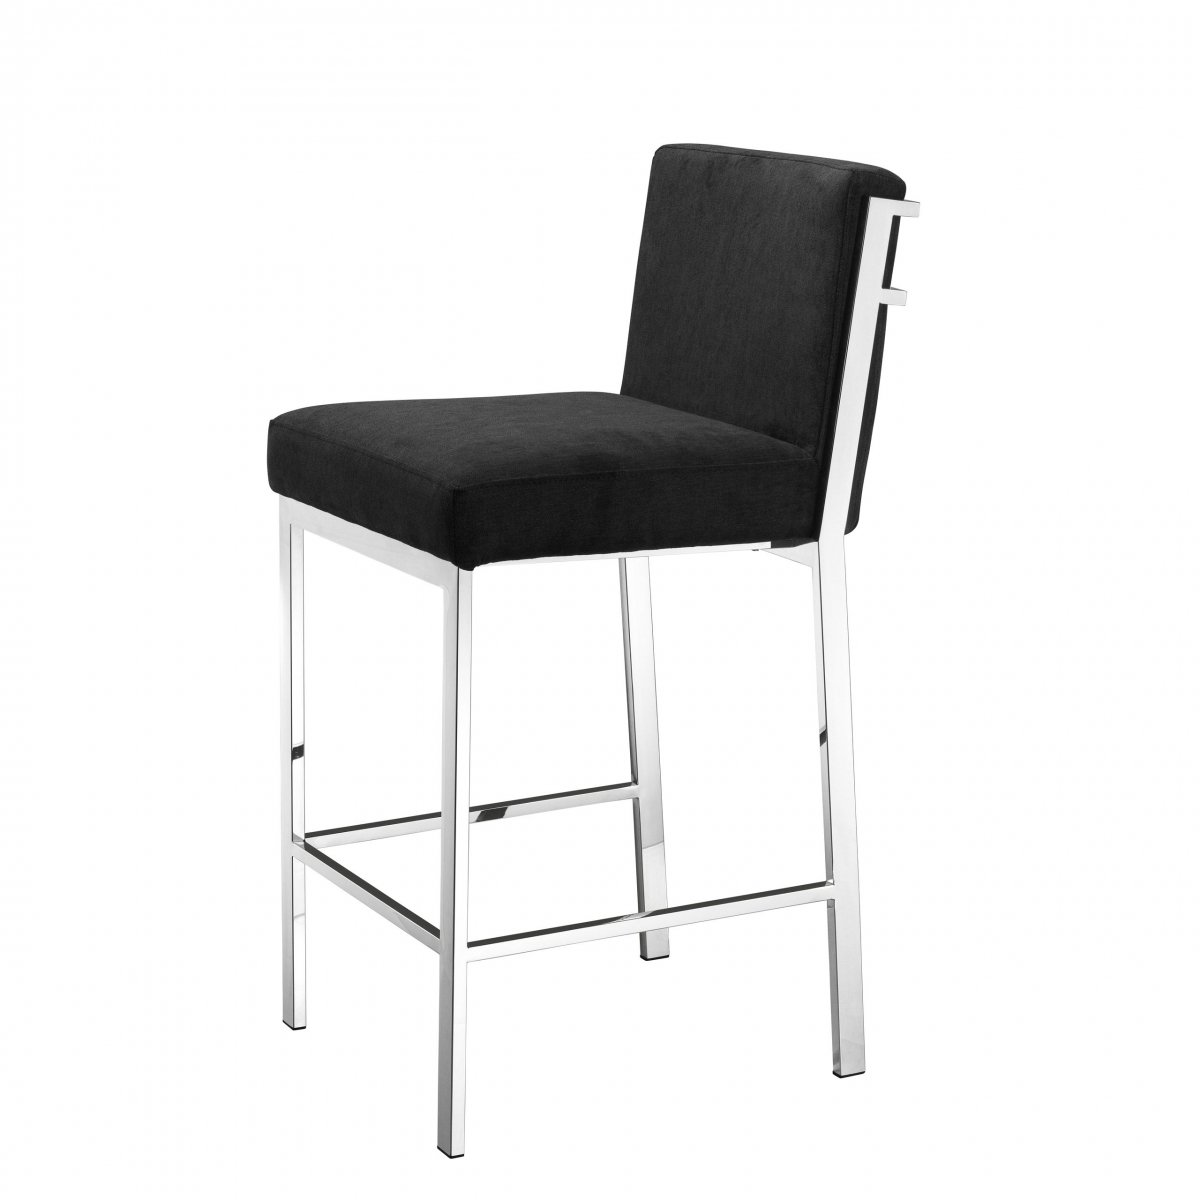 Полубарный стул Eichholtz Counter Stool Scott Steel  - фото 1